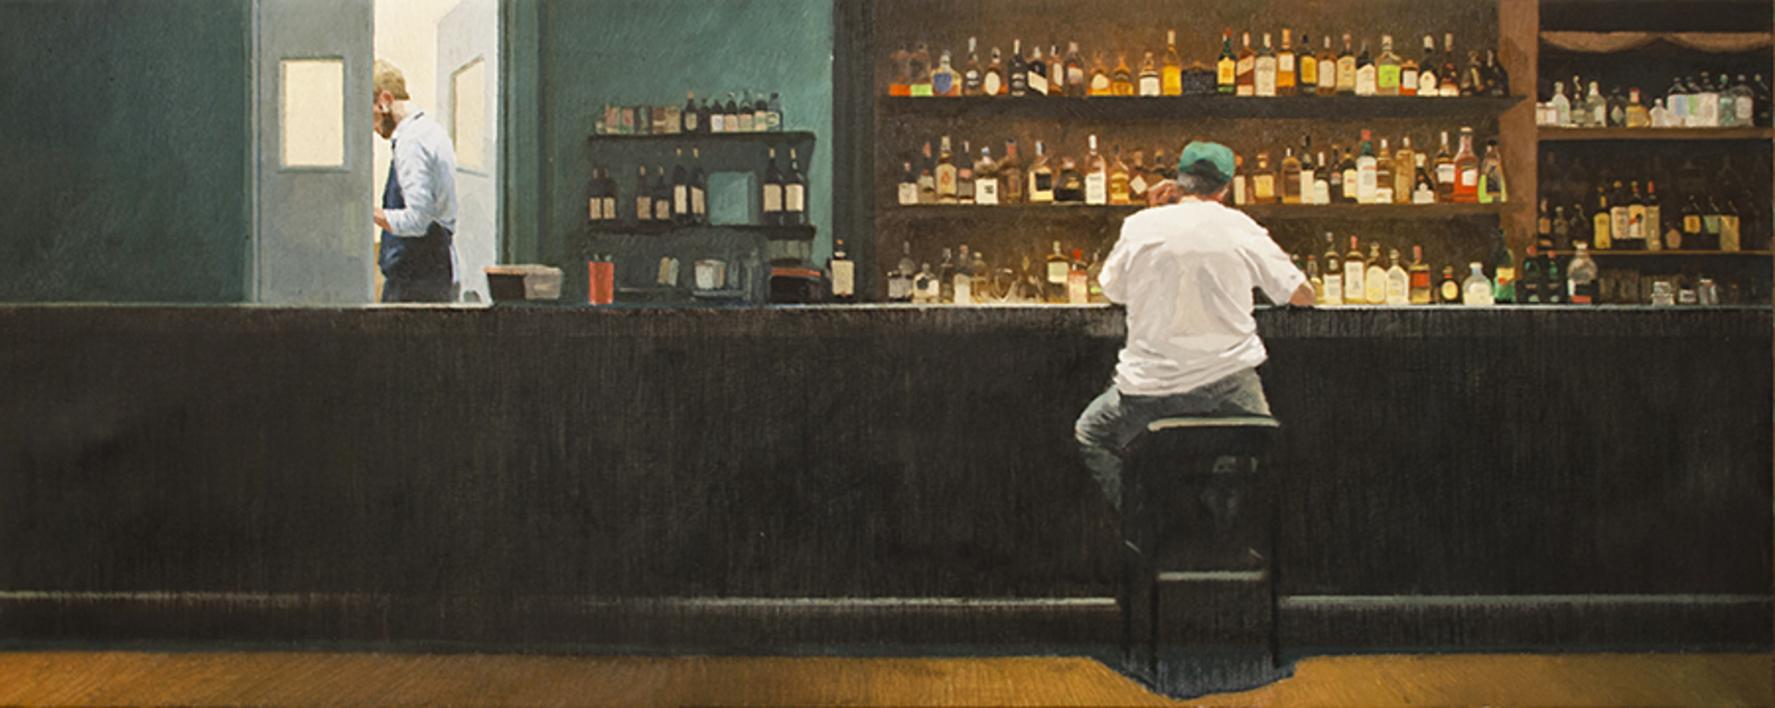 Noche en vela  Pintura de Orrite   Compra arte en Flecha.es